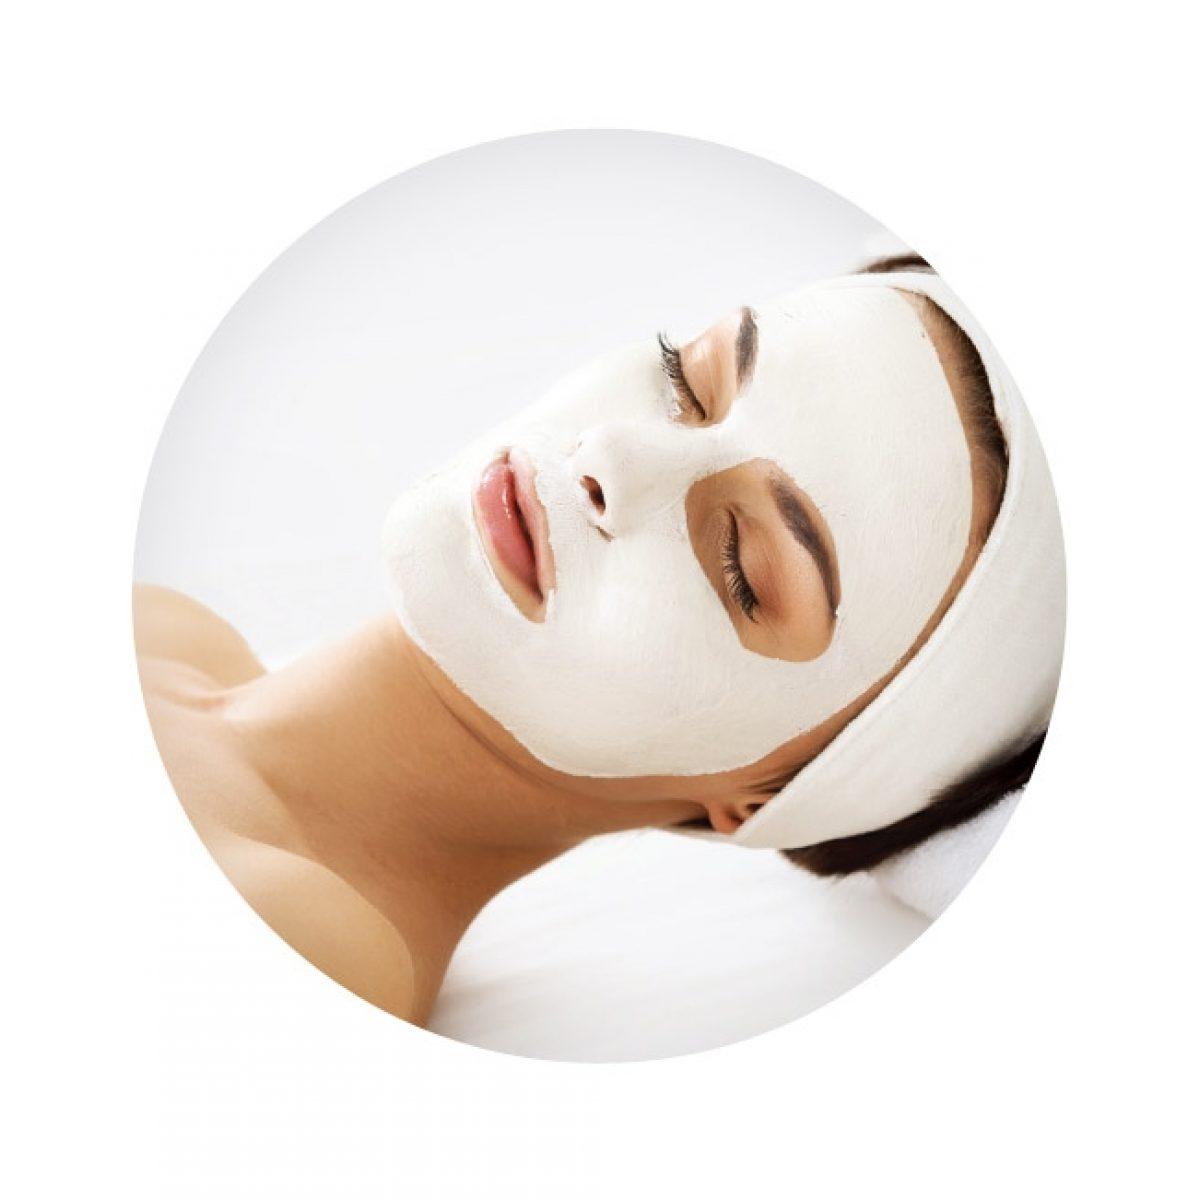 Dermastir Peel Off Mask – Whitening